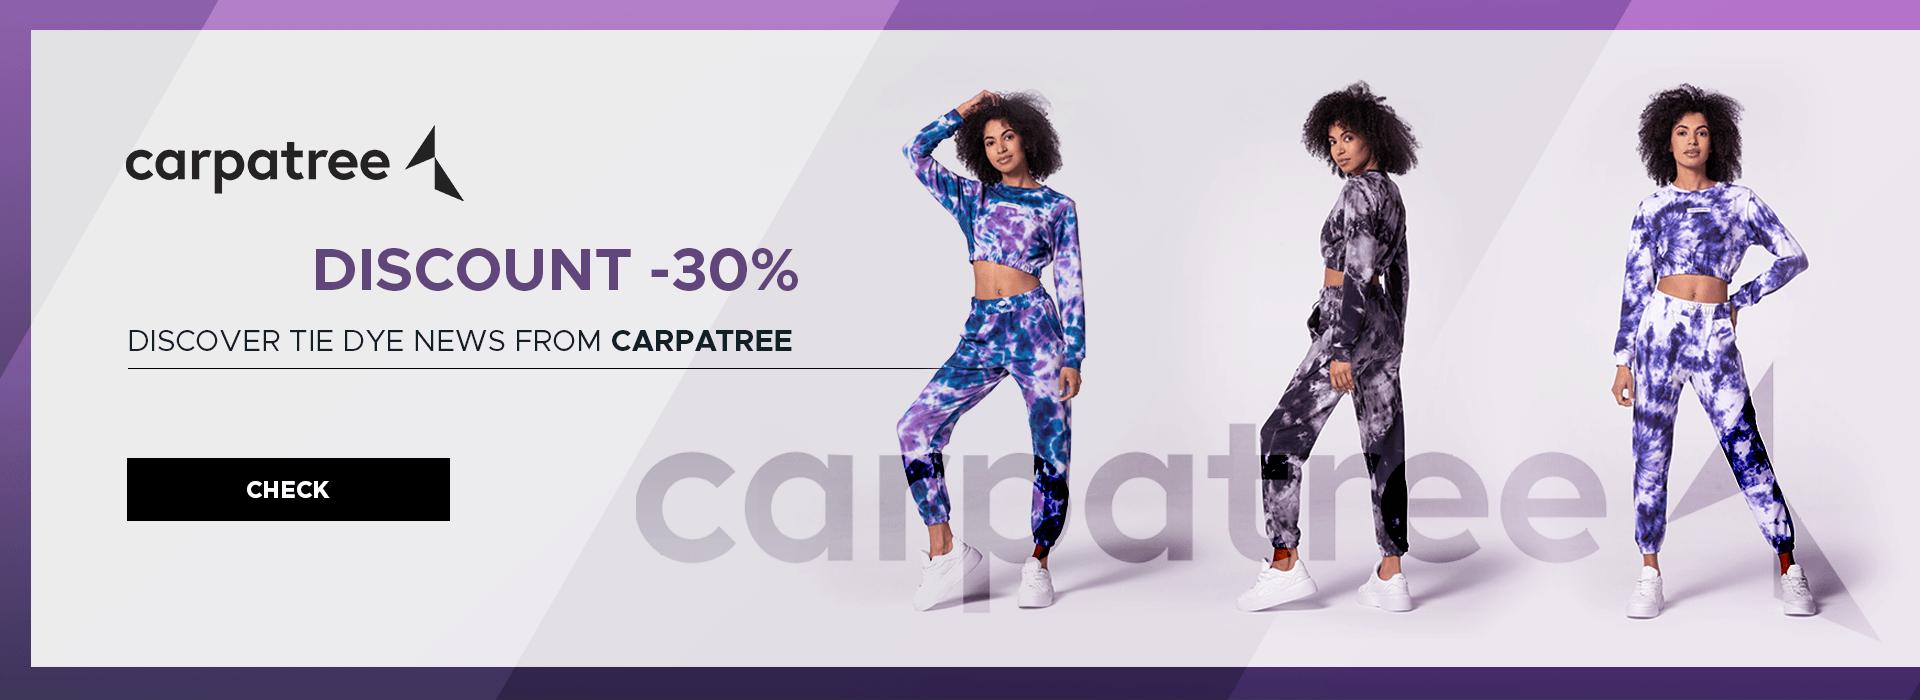 Carpatree - New